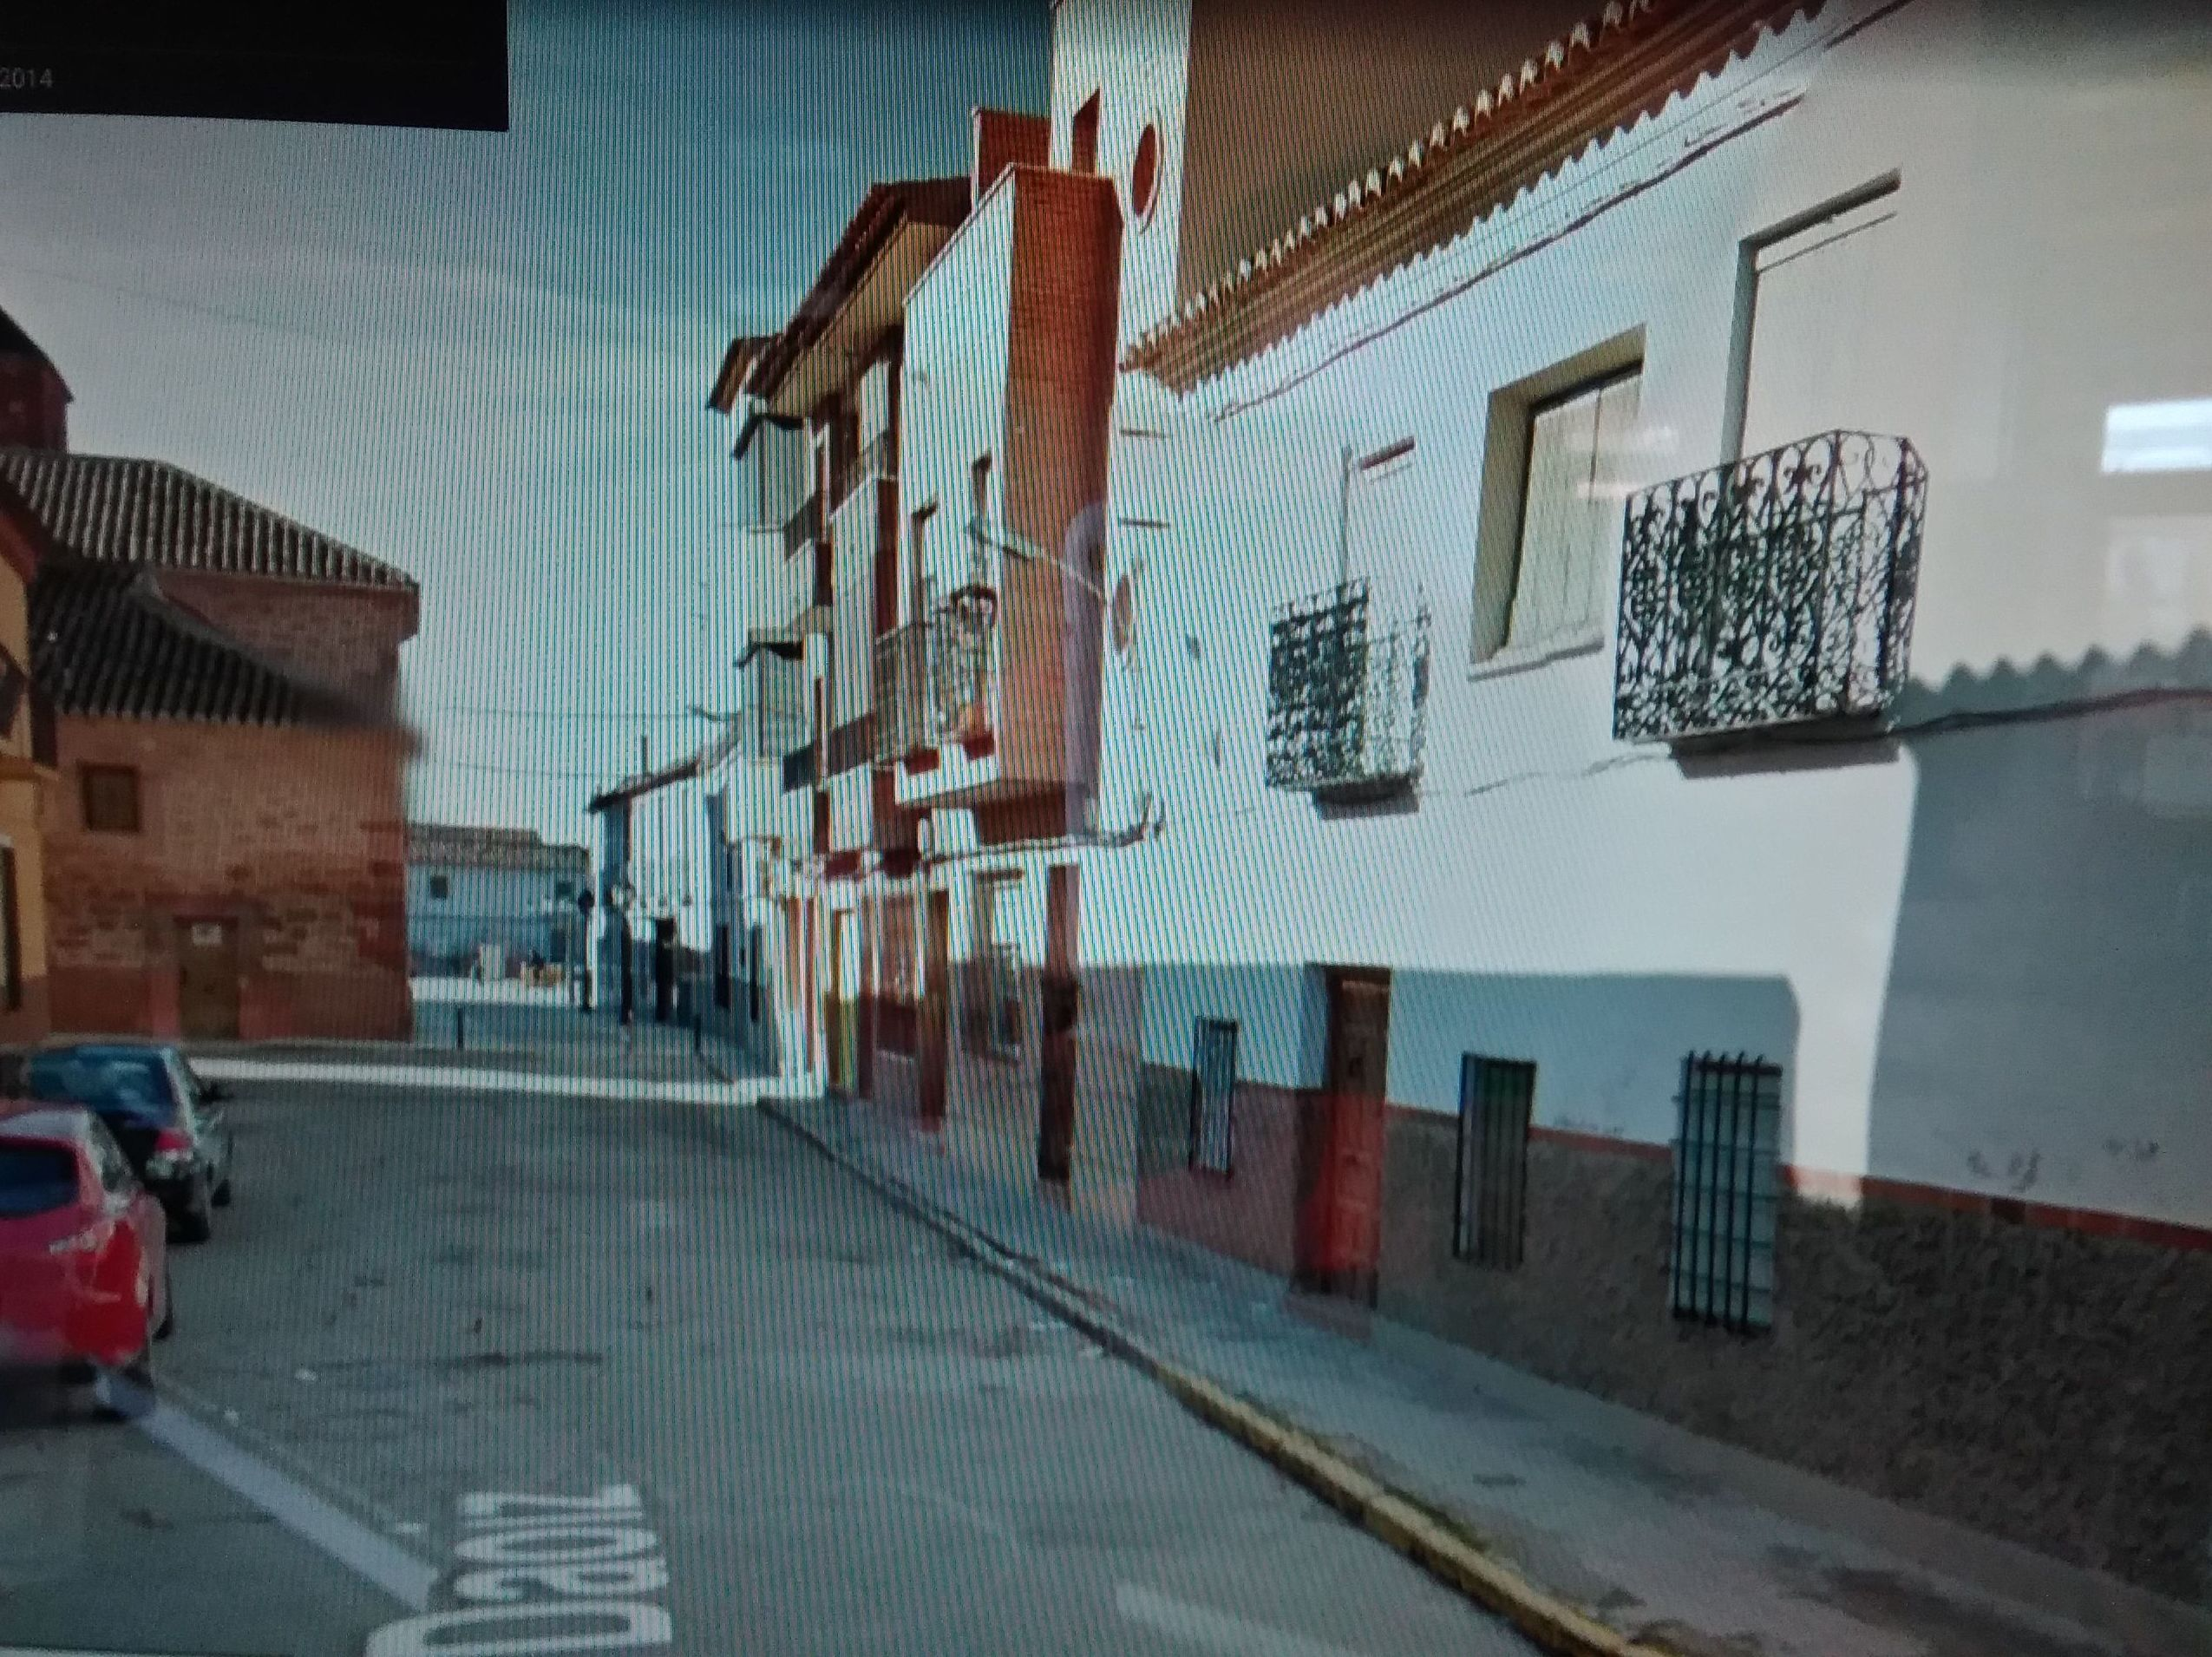 Venta casa calle Daoiz: Inmuebles Urbanos de ANTONIO ARAGONÉS DÍAZ PAVÓN